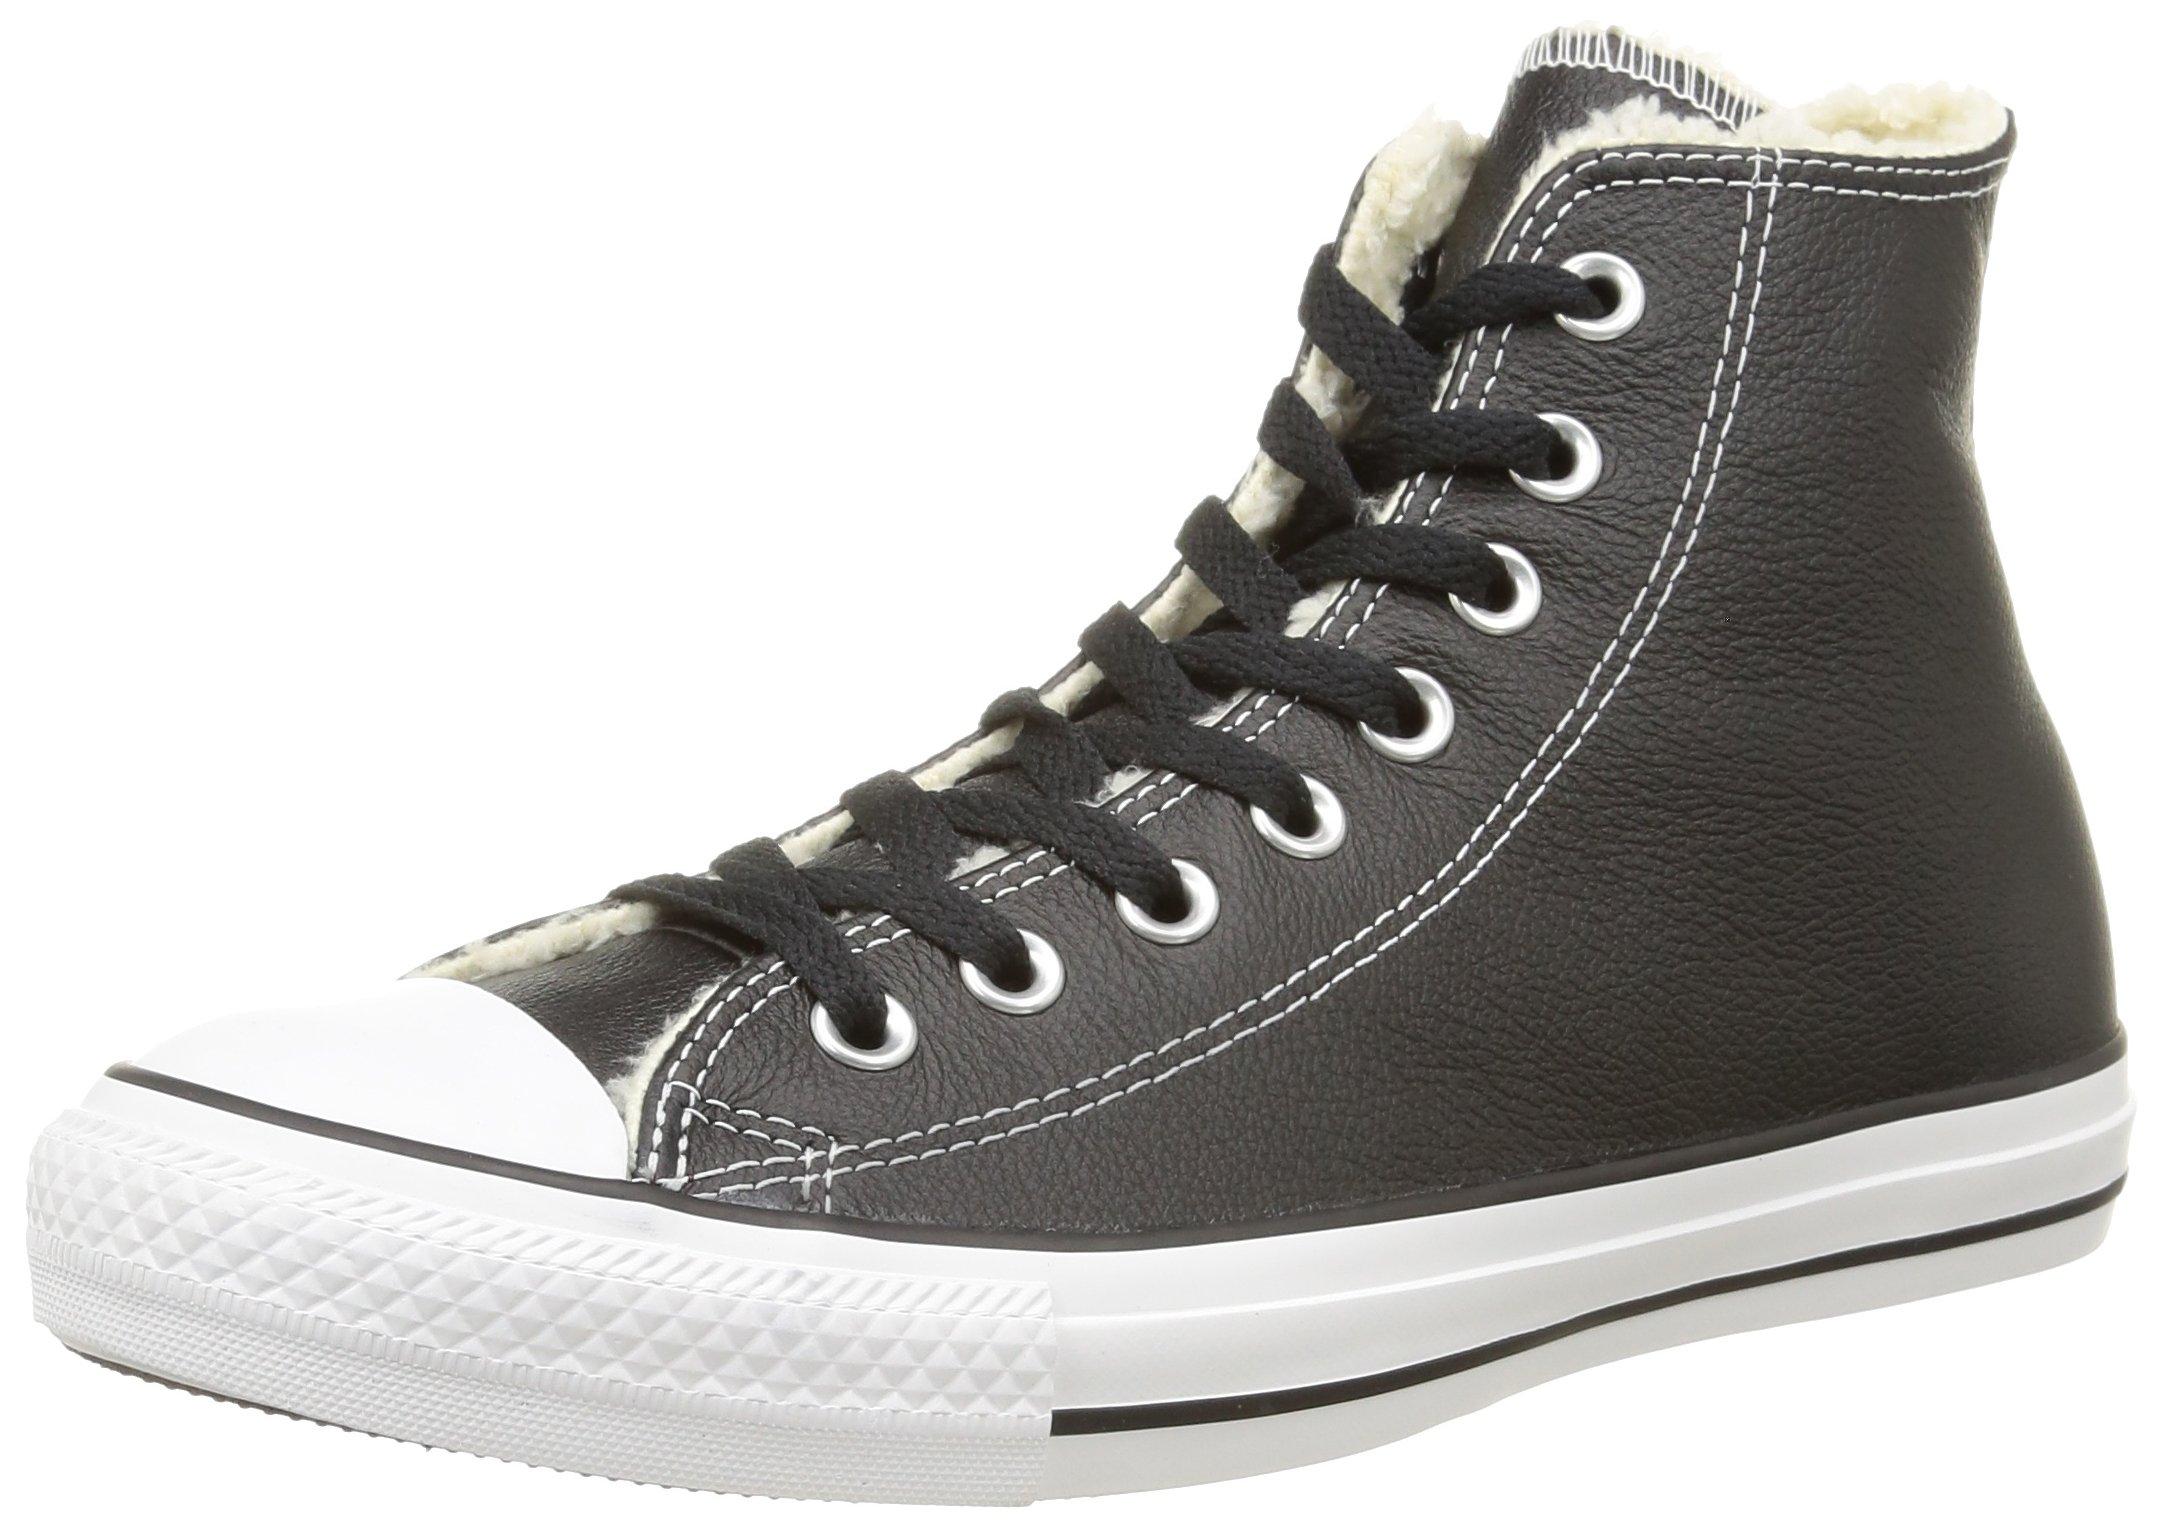 3e054a8ca39 Galleon - Converse Unisex Chuck Taylor Shearling Leather Black White Black  Sneaker - 7.5 Men - 9.5 Women